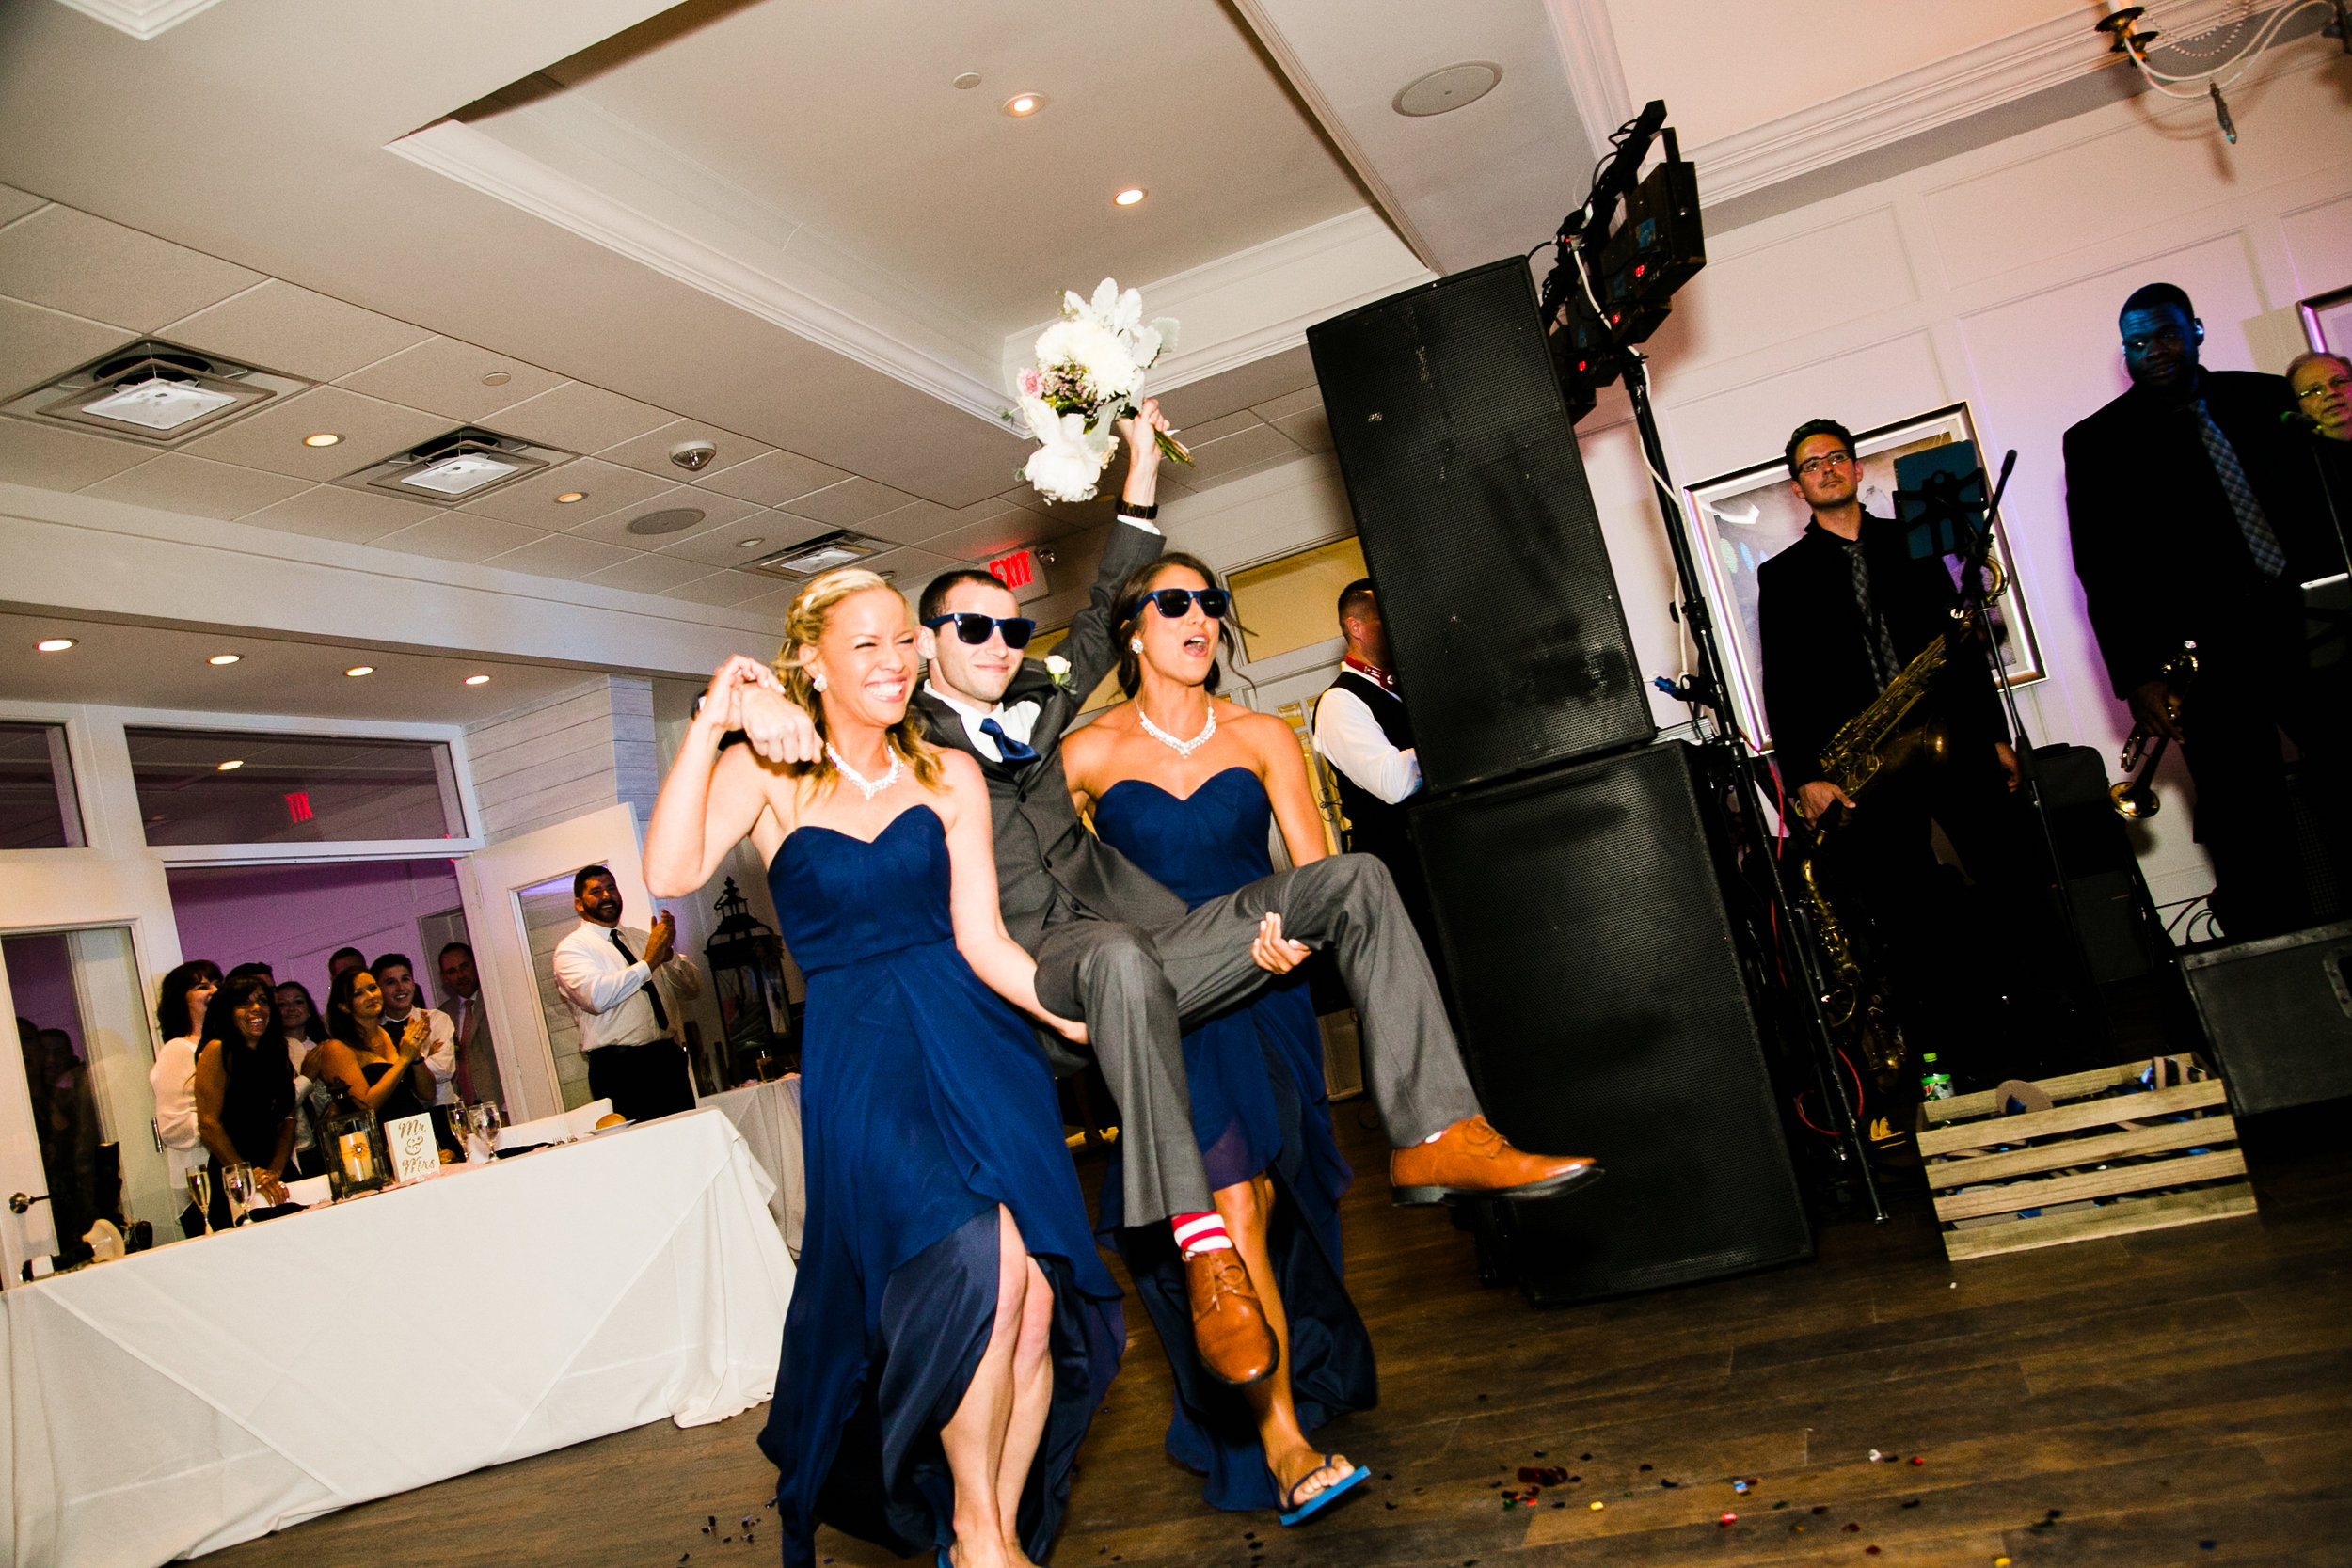 ICONA GOLDEN INN AVALON NJ WEDDING PHOTOGRAPHY  - 065.jpg